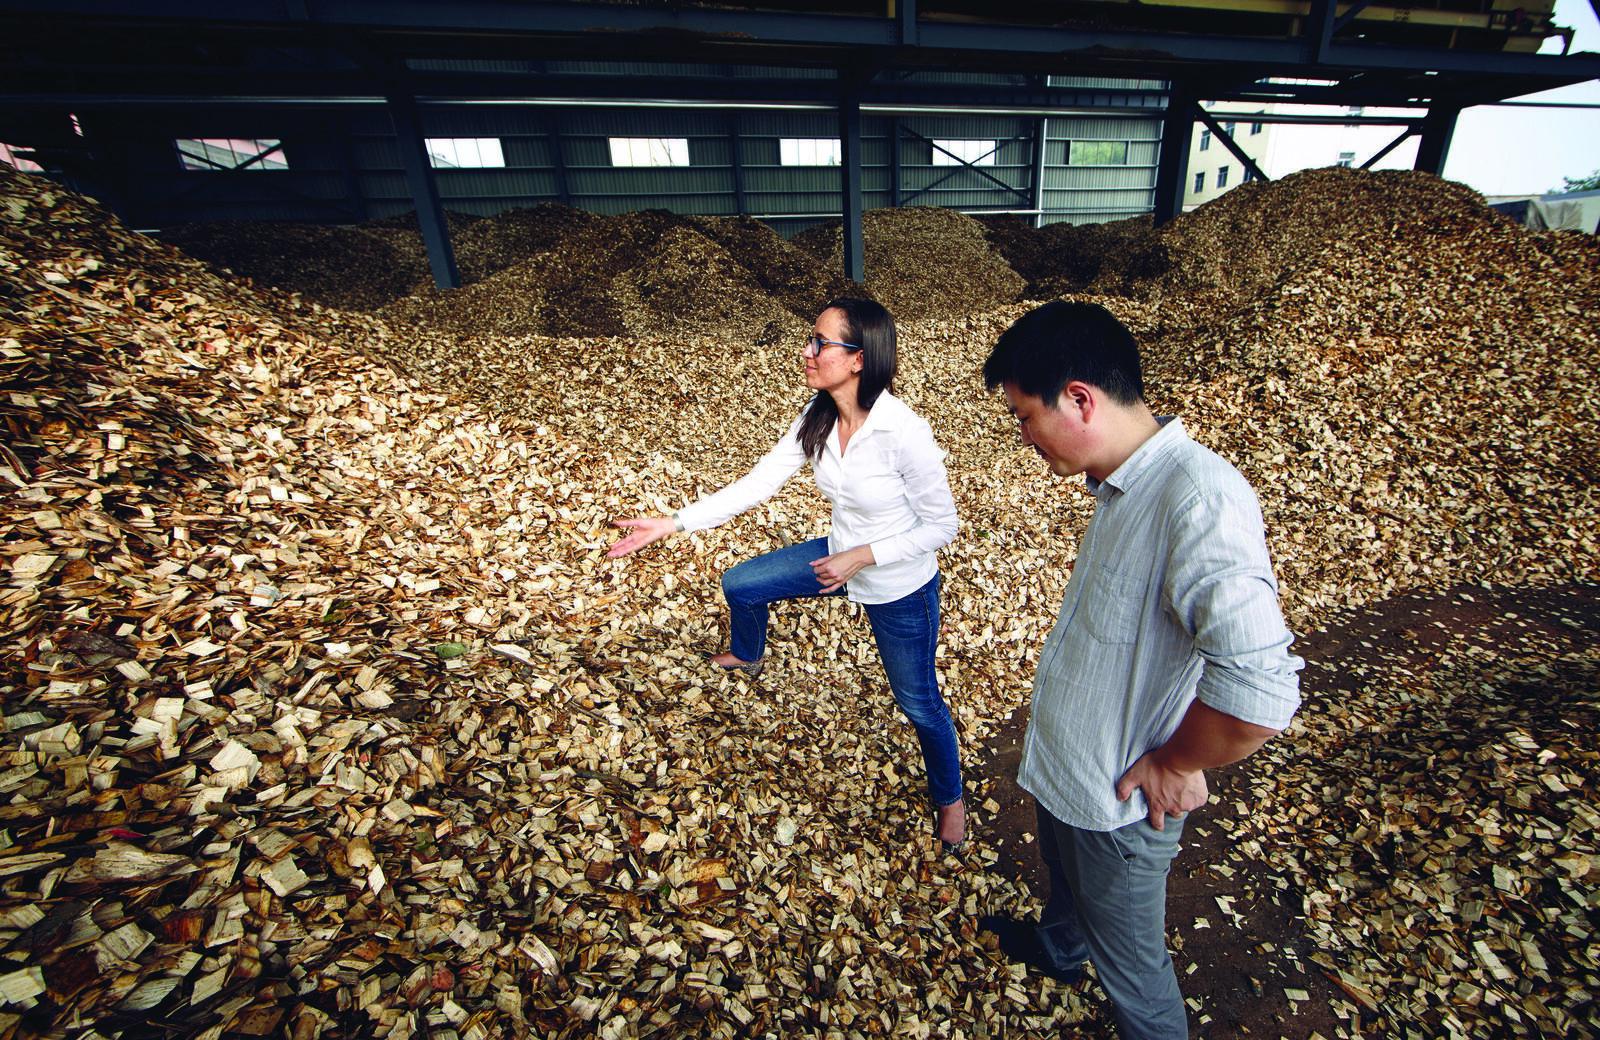 Freshly cut wood at a paper mill in Tengzhou, China